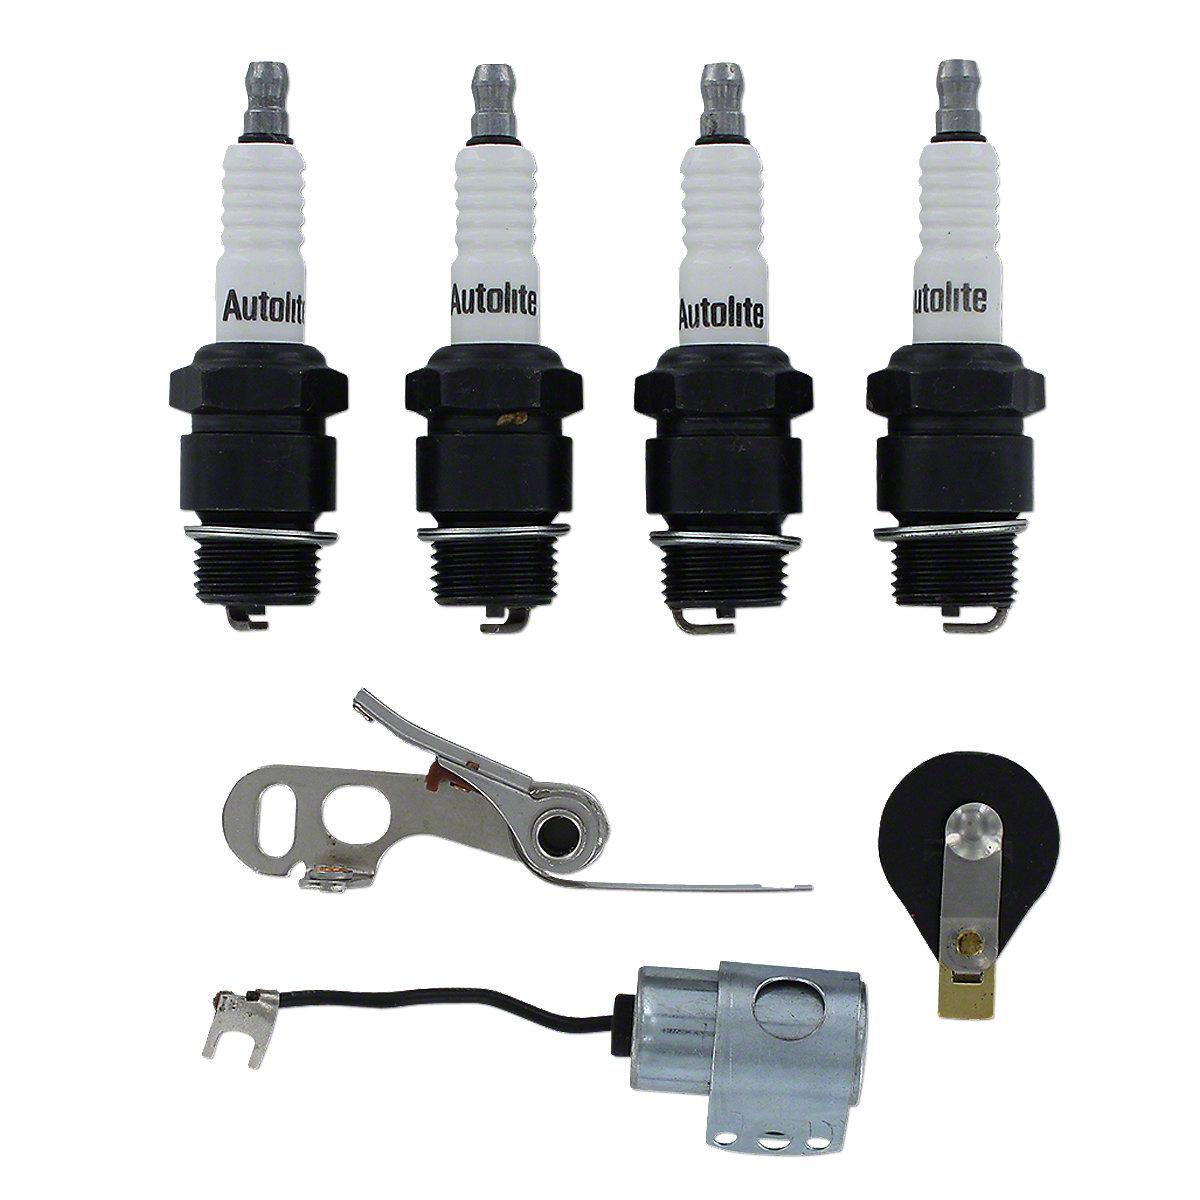 Includes: Points, Condenser, Rotor, Autolite Plugs  Fits Oliver:  60 66 660 Super 44 Super 55 Super 66 440 550